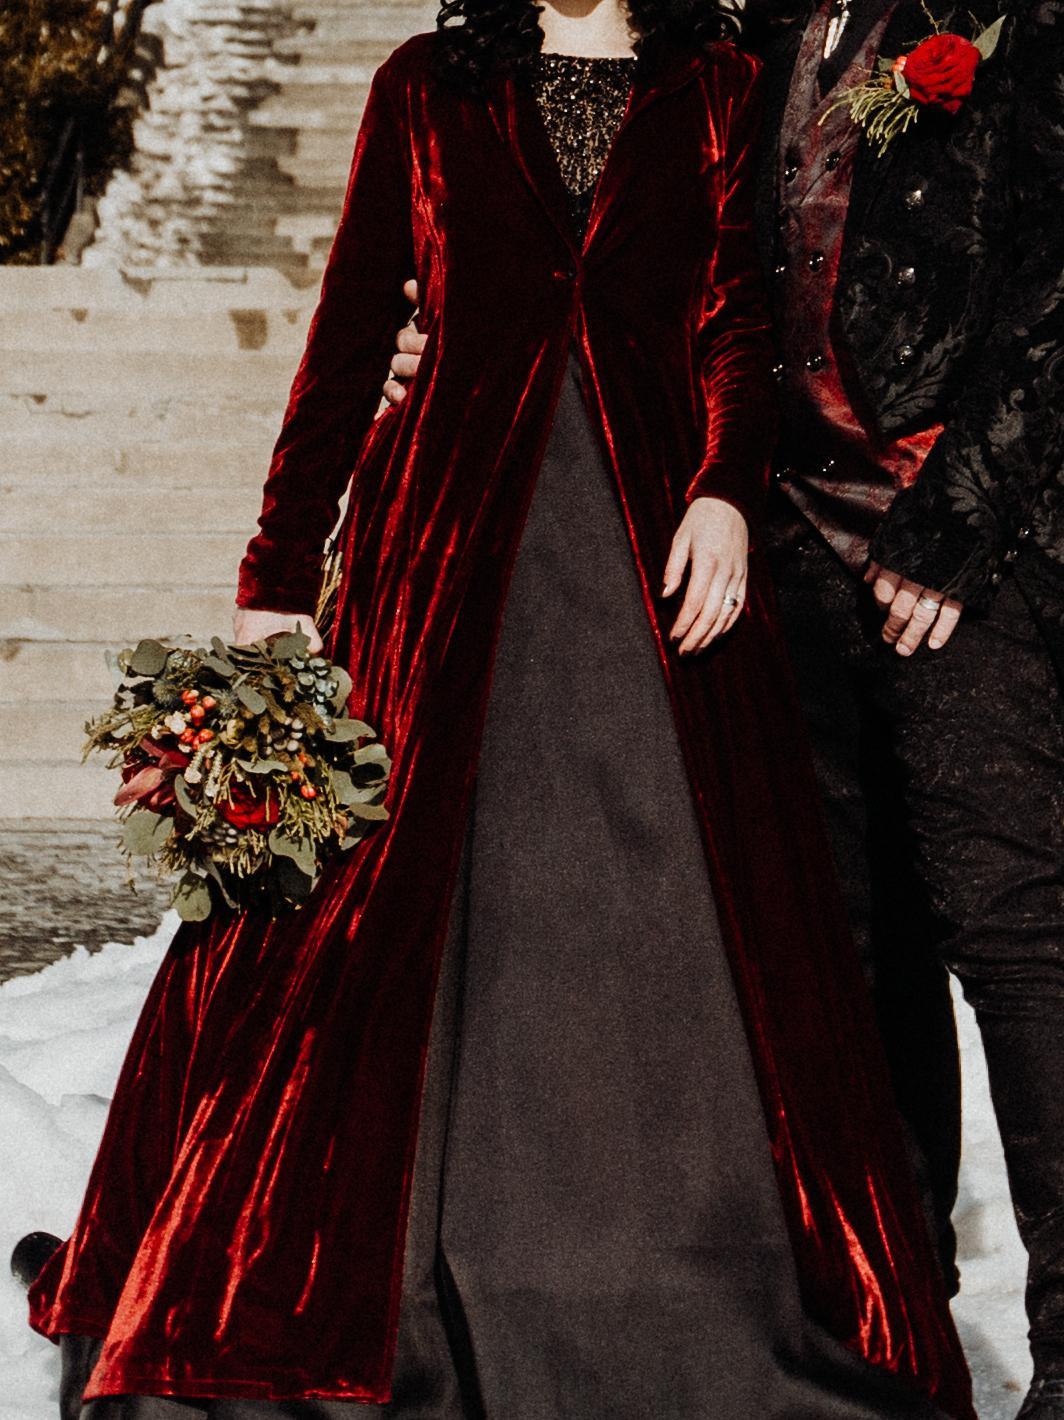 Kabát červený - Obrázek č. 1